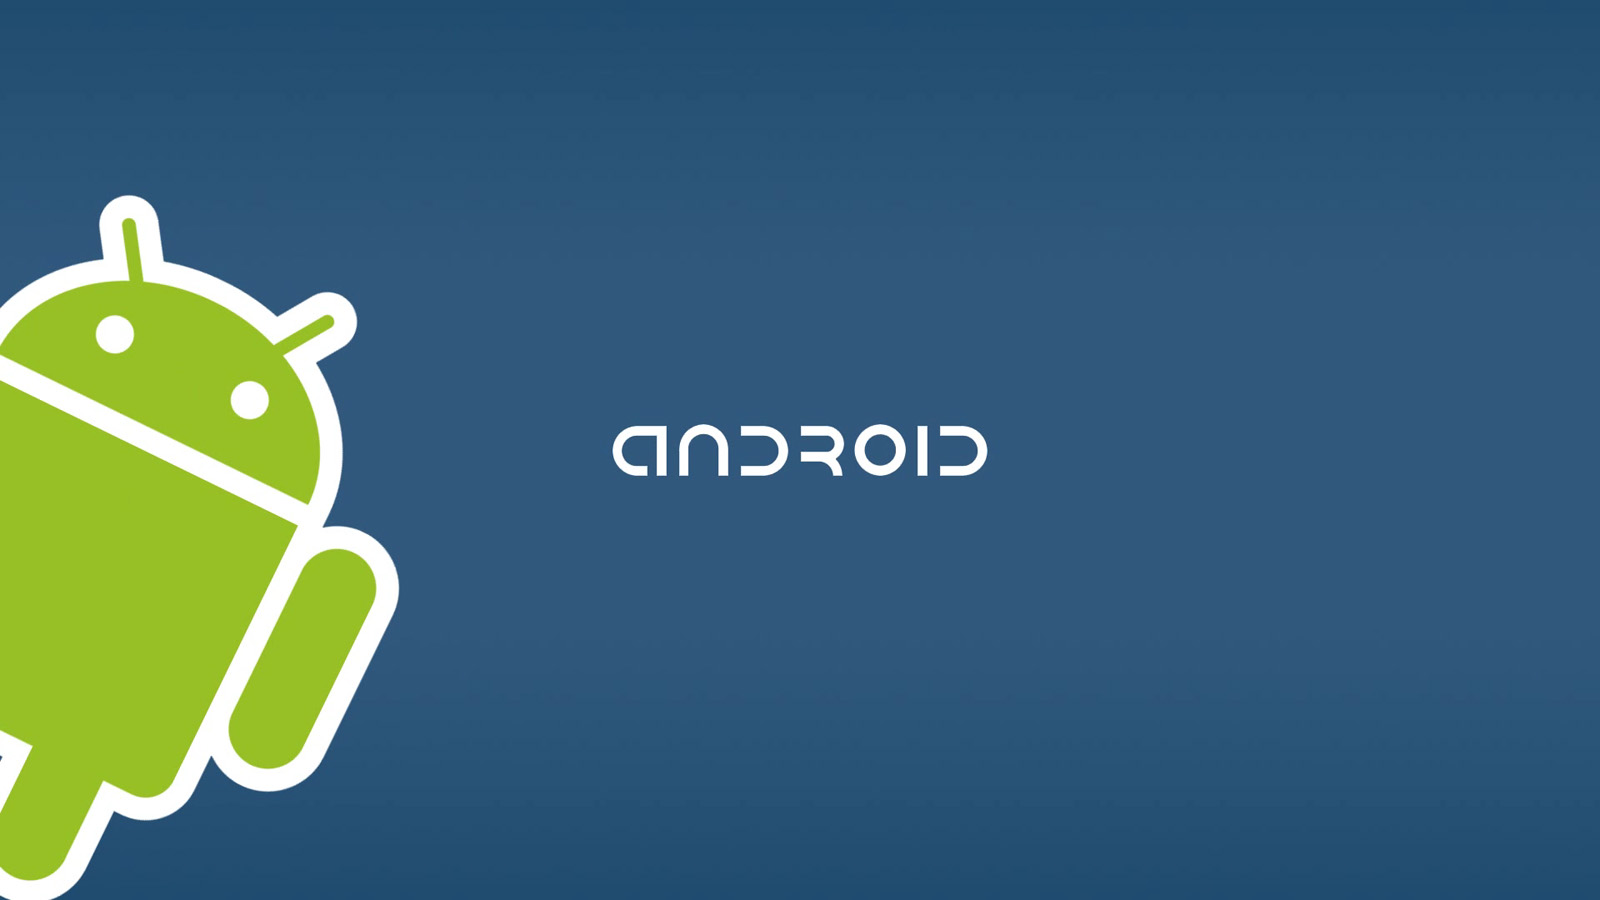 http://4.bp.blogspot.com/_JSR8IC77Ub4/TATTWI6KzyI/AAAAAAAAAhM/u_Z1i97eNG0/s1600/android.jpg